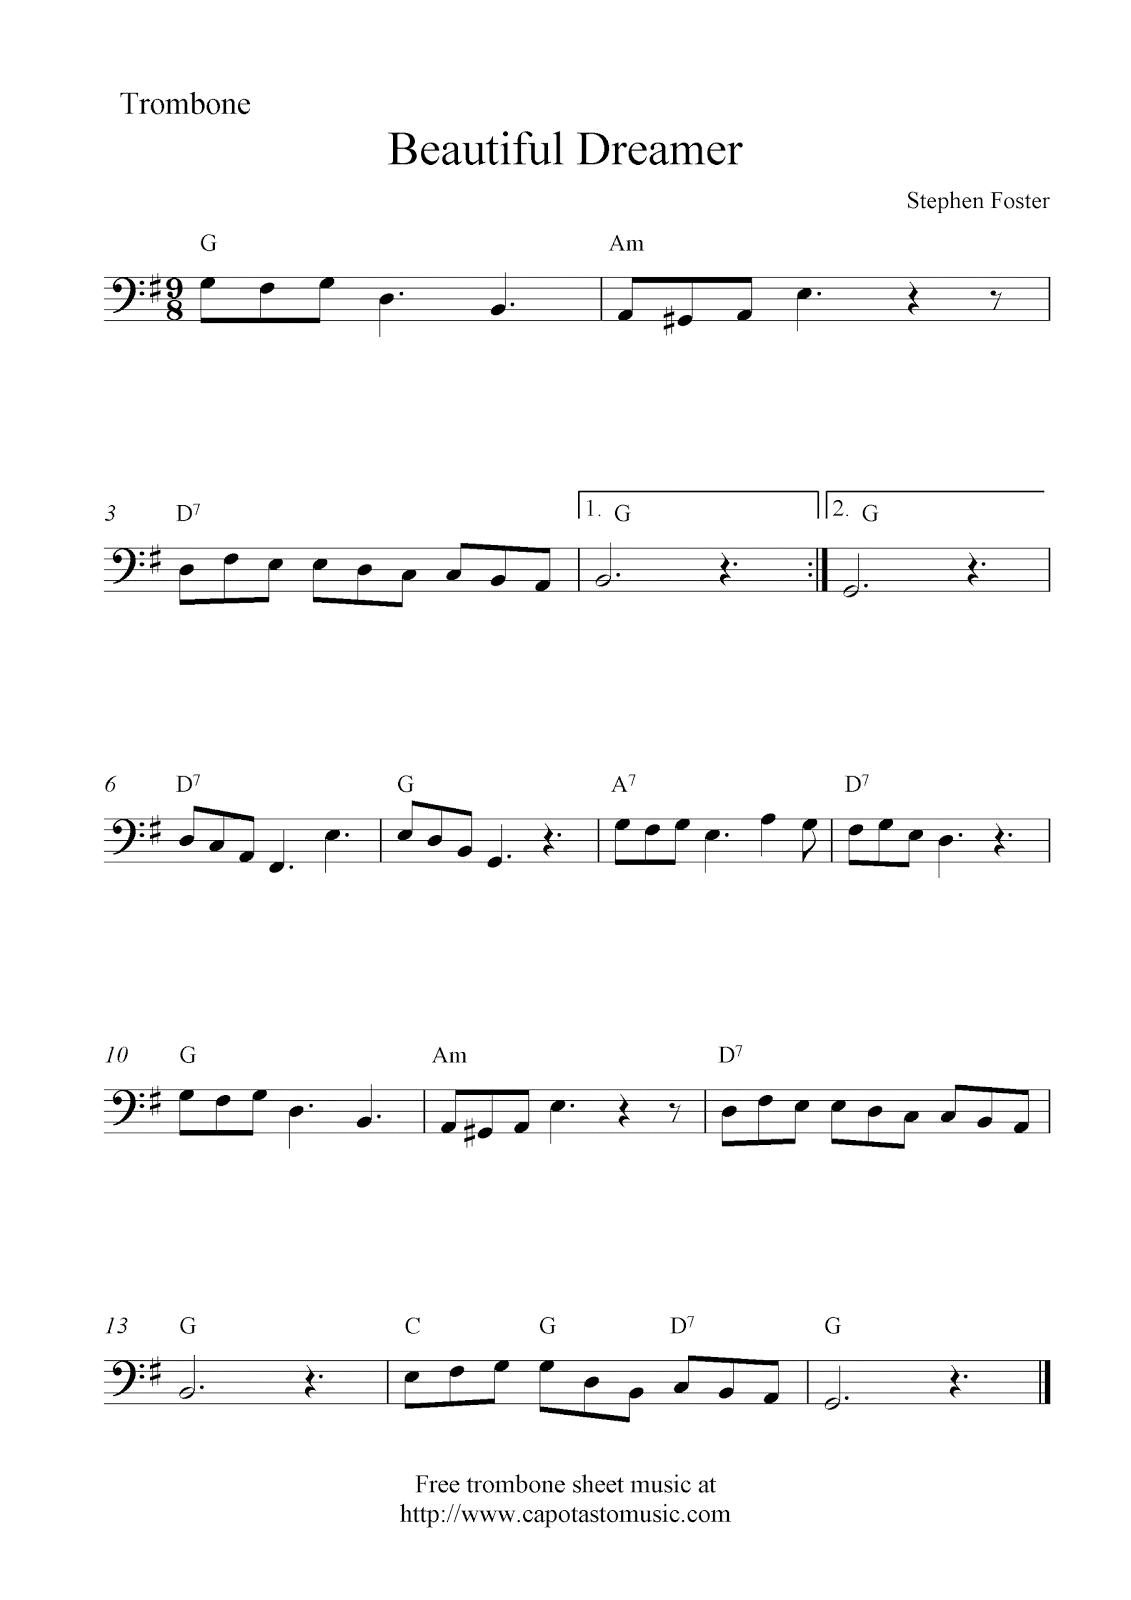 Free trombone sheet music beautiful dreamer